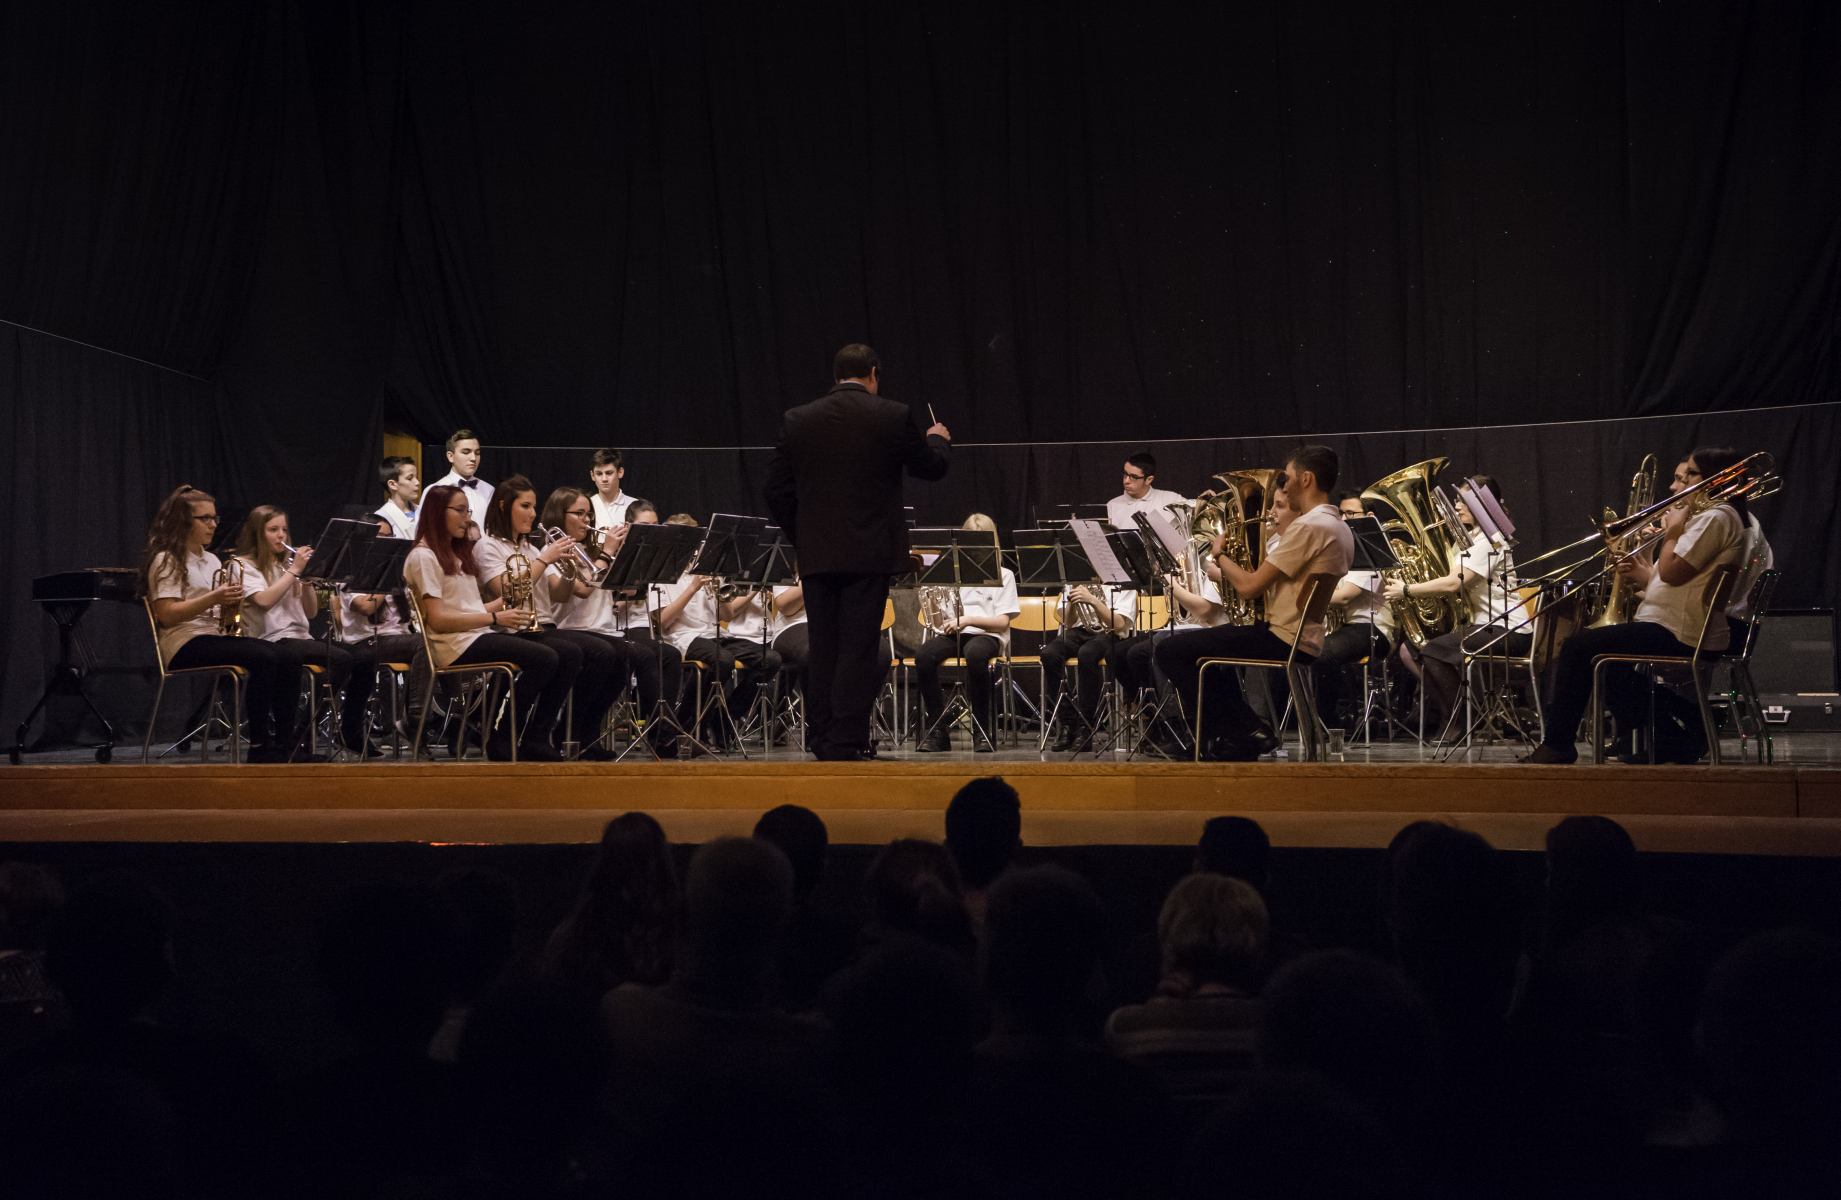 170211_concert_annuel17-017